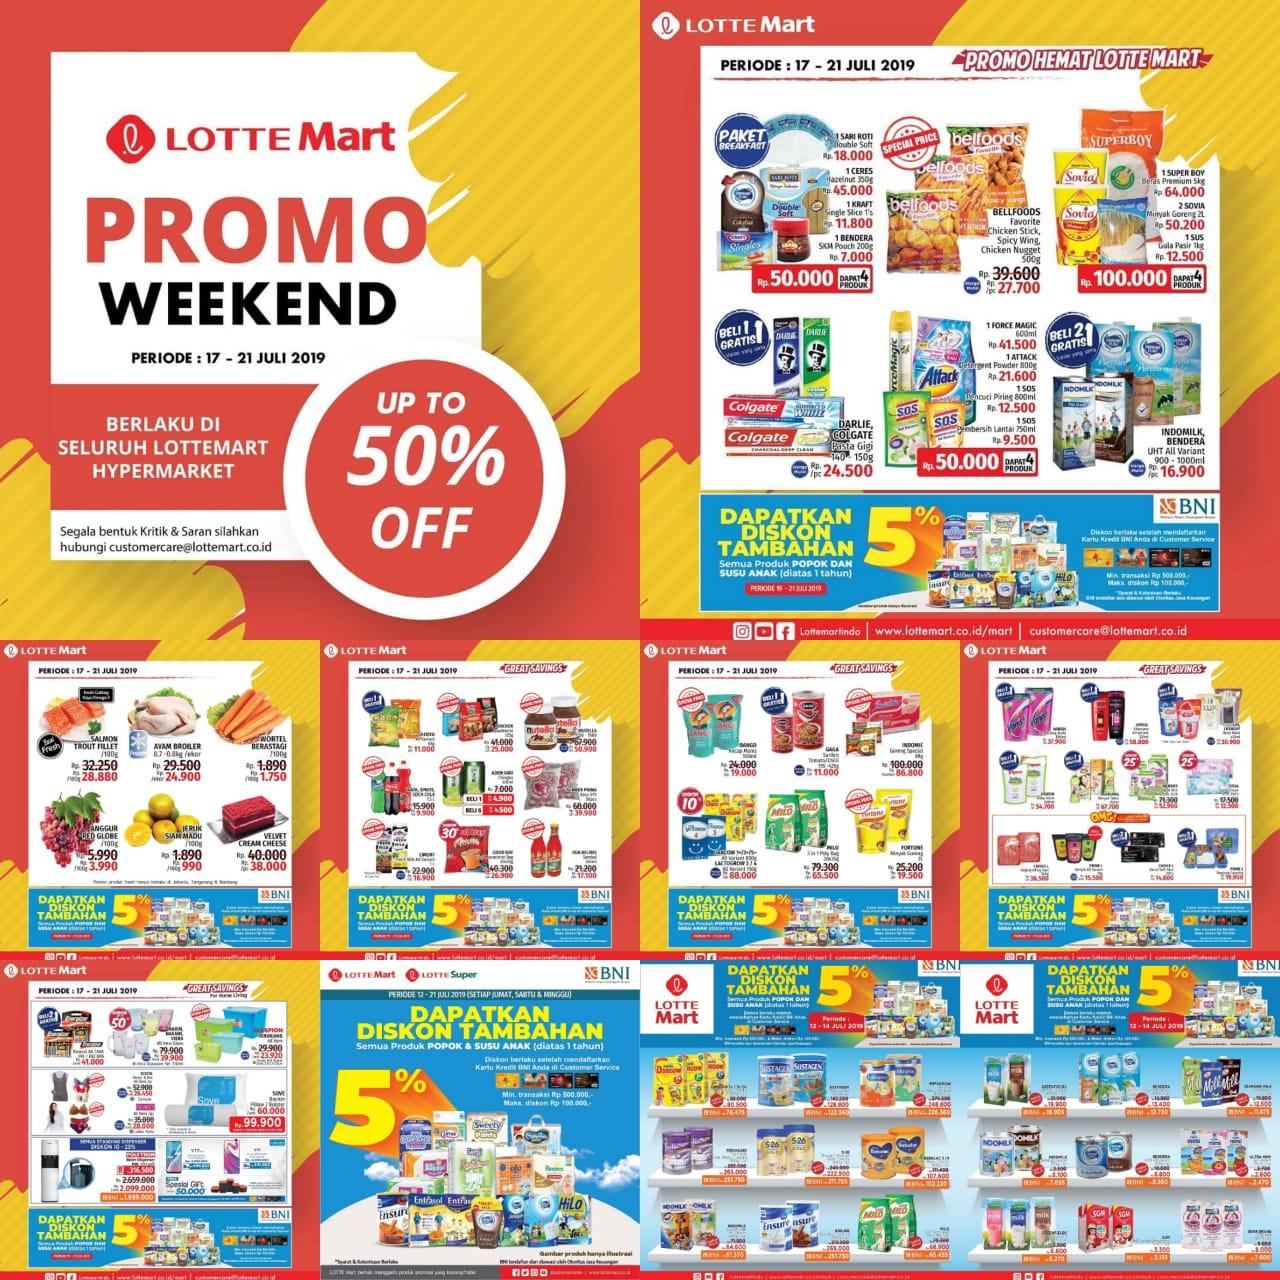 Katalog Promo JSM Lottemart 17-21 Juli 2019!